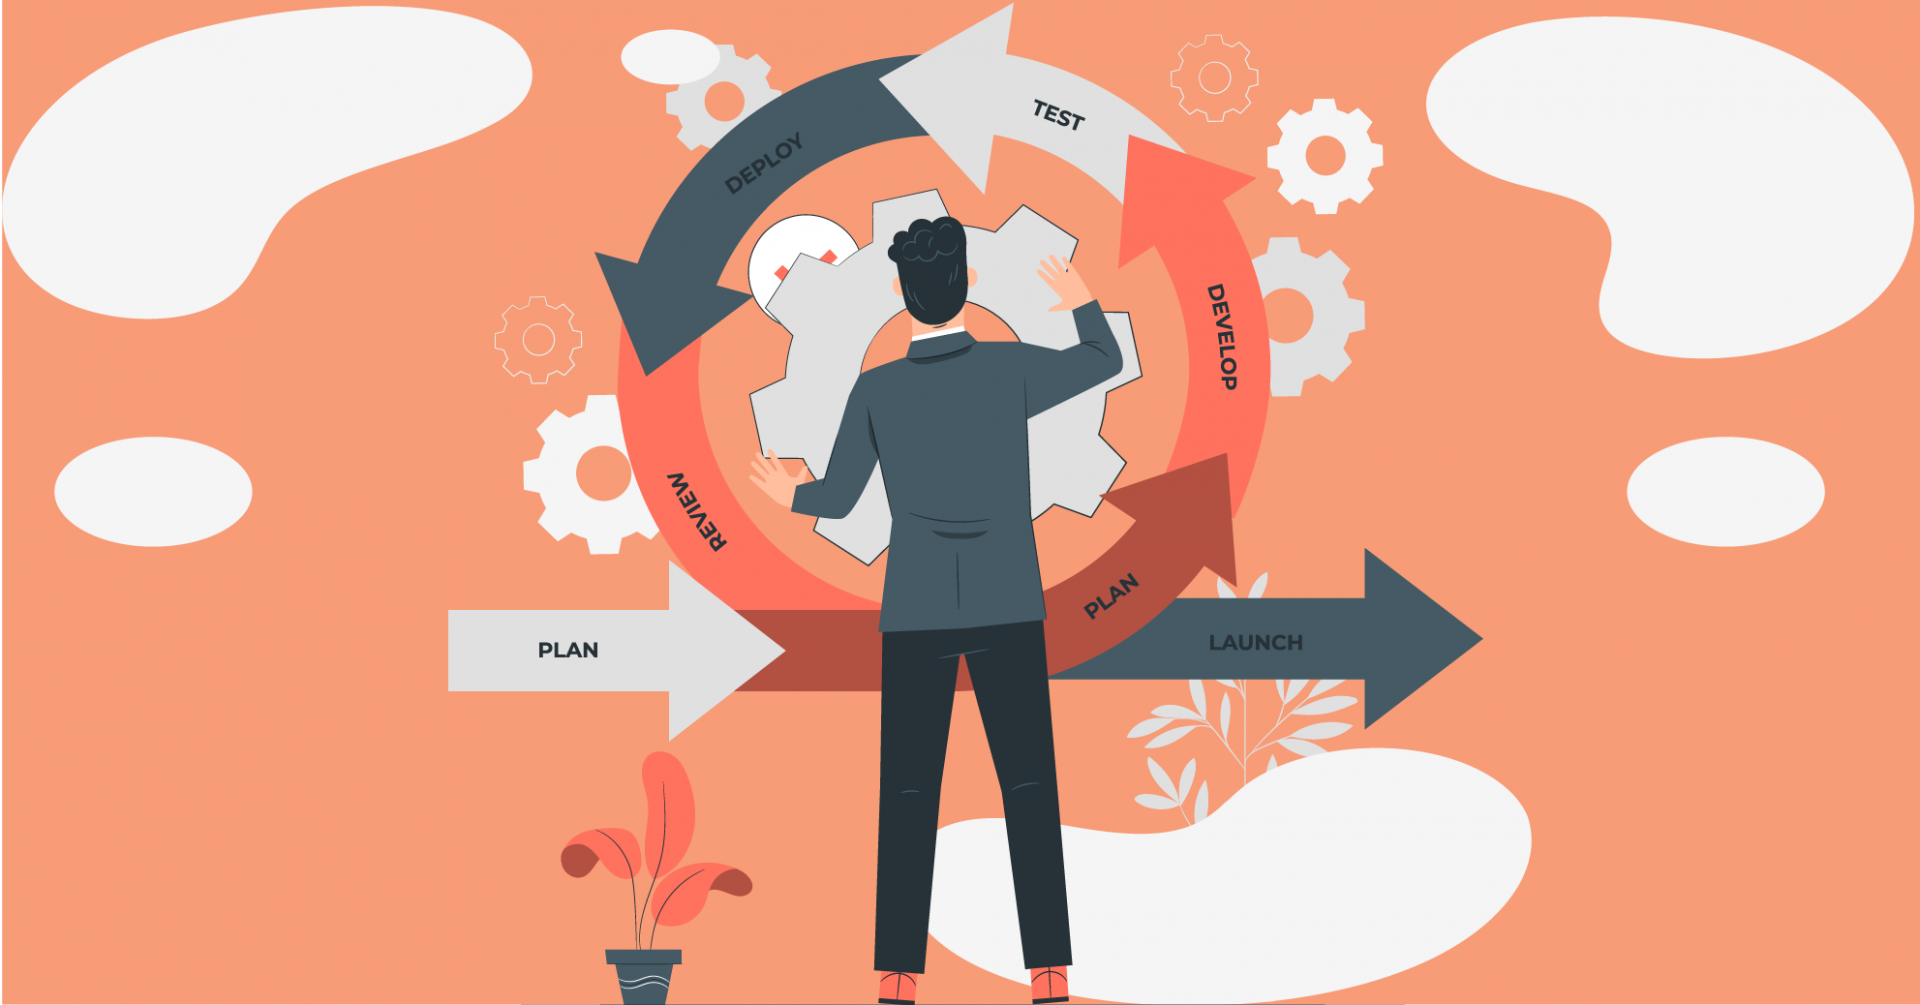 Focus -лах ёстой ажлаа Flow -ийн тусламжтай шийдье.